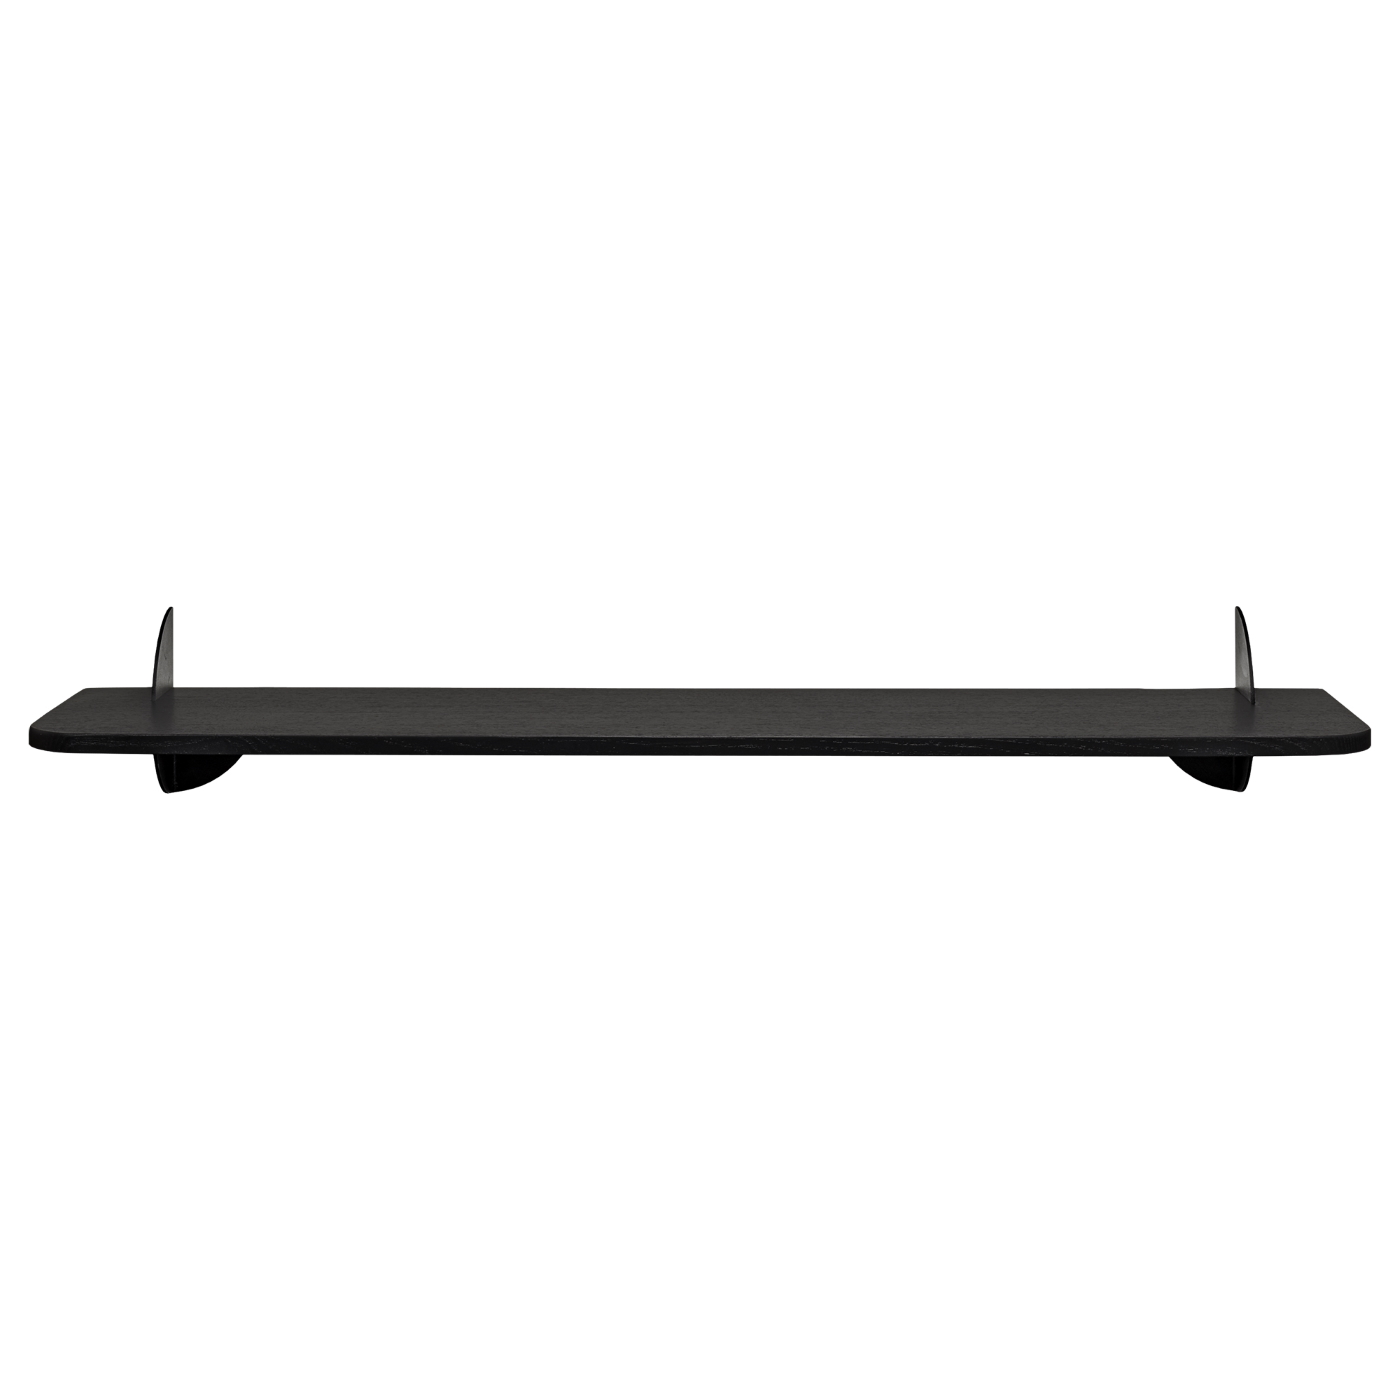 Hylla AEDES svart/ svart 80 cm, AYTM